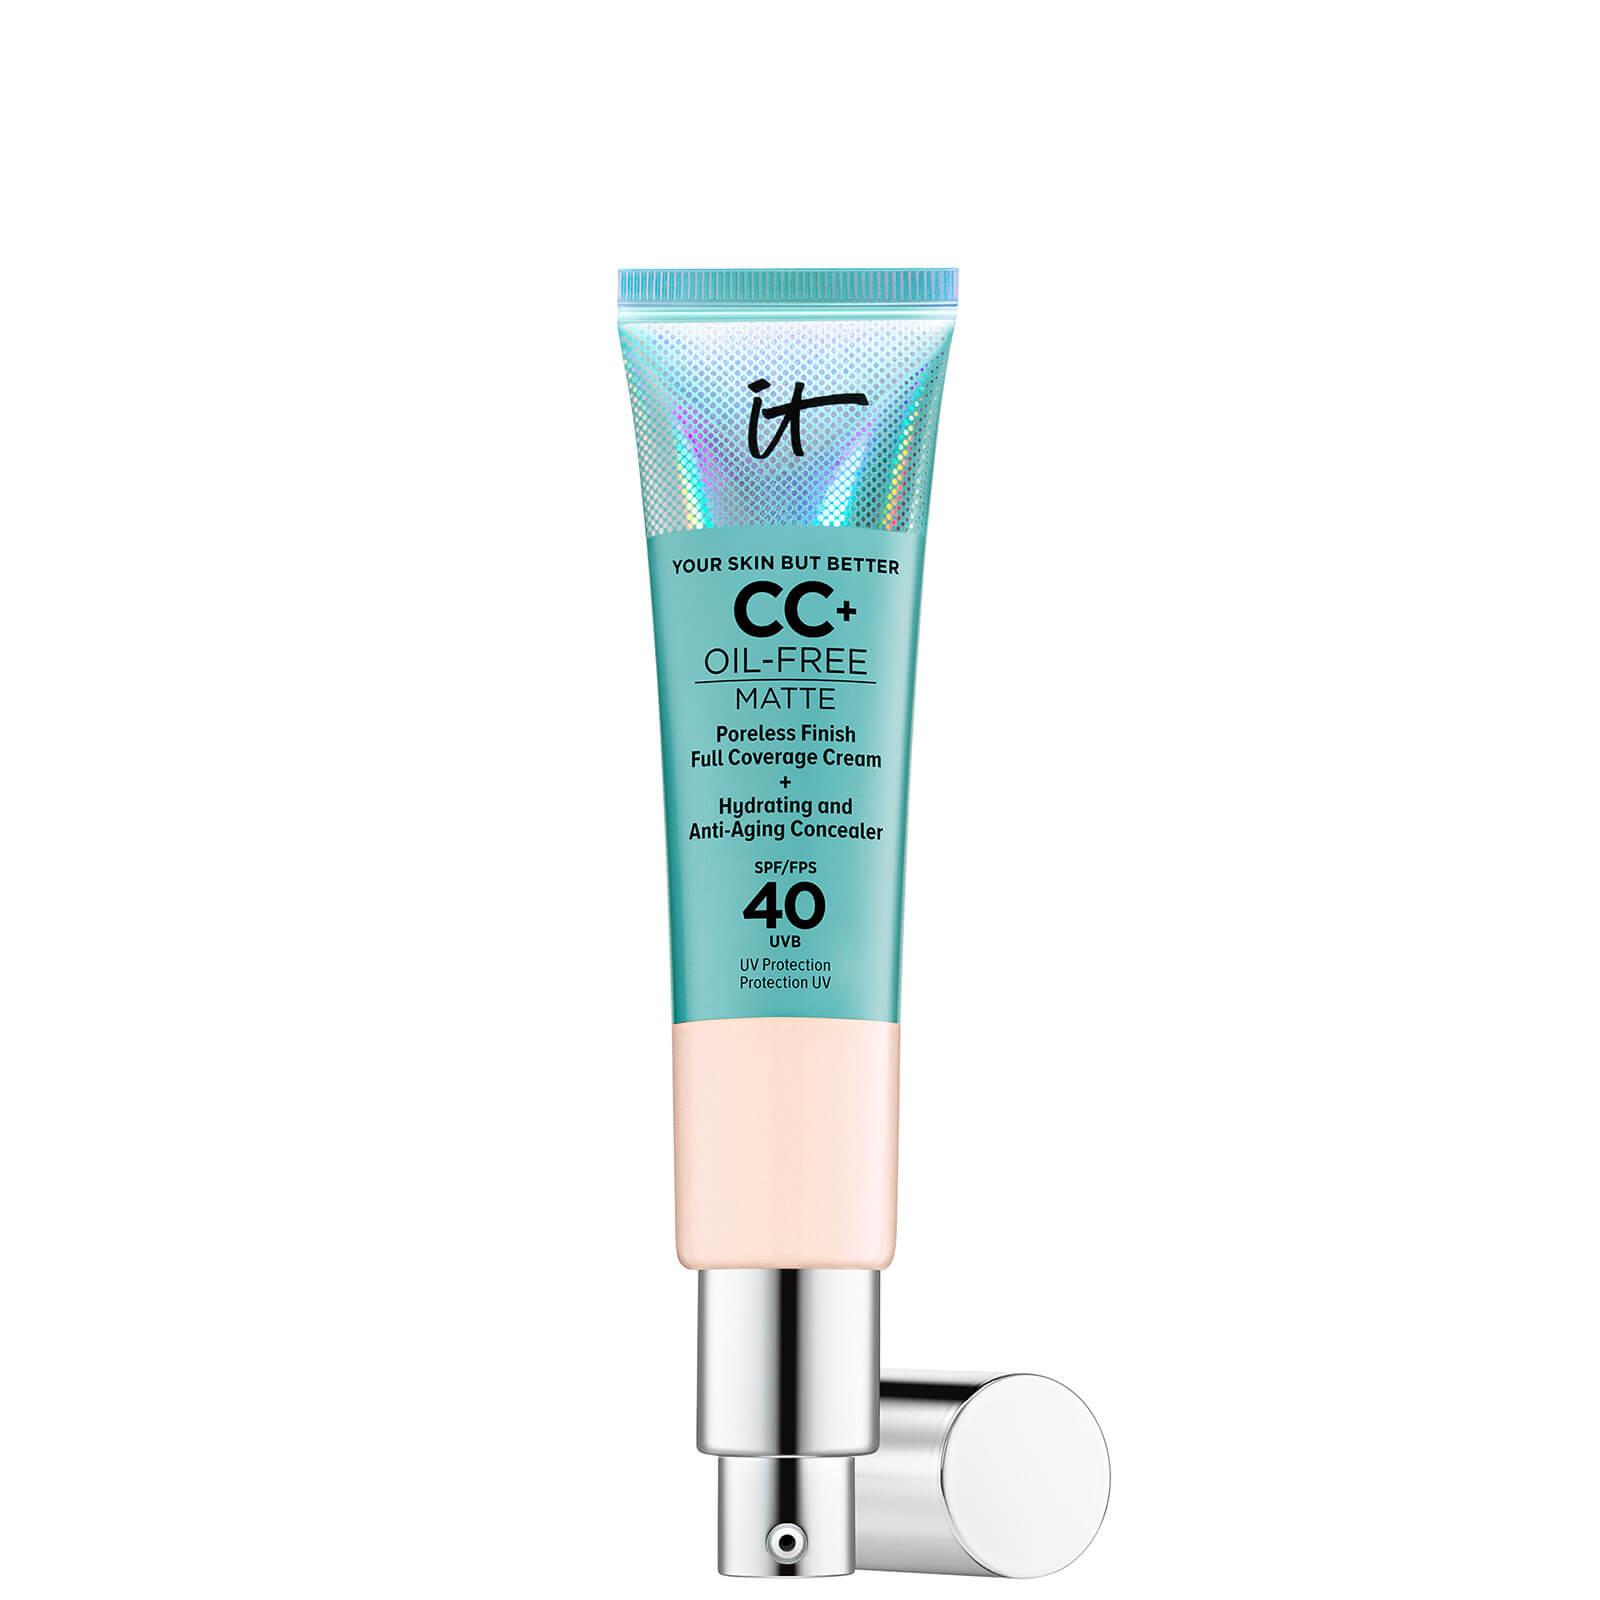 Купить IT Cosmetics Your Skin But Better CC+ Oil-Free Matte SPF40 32ml (Various Shades) - Fair Ivory